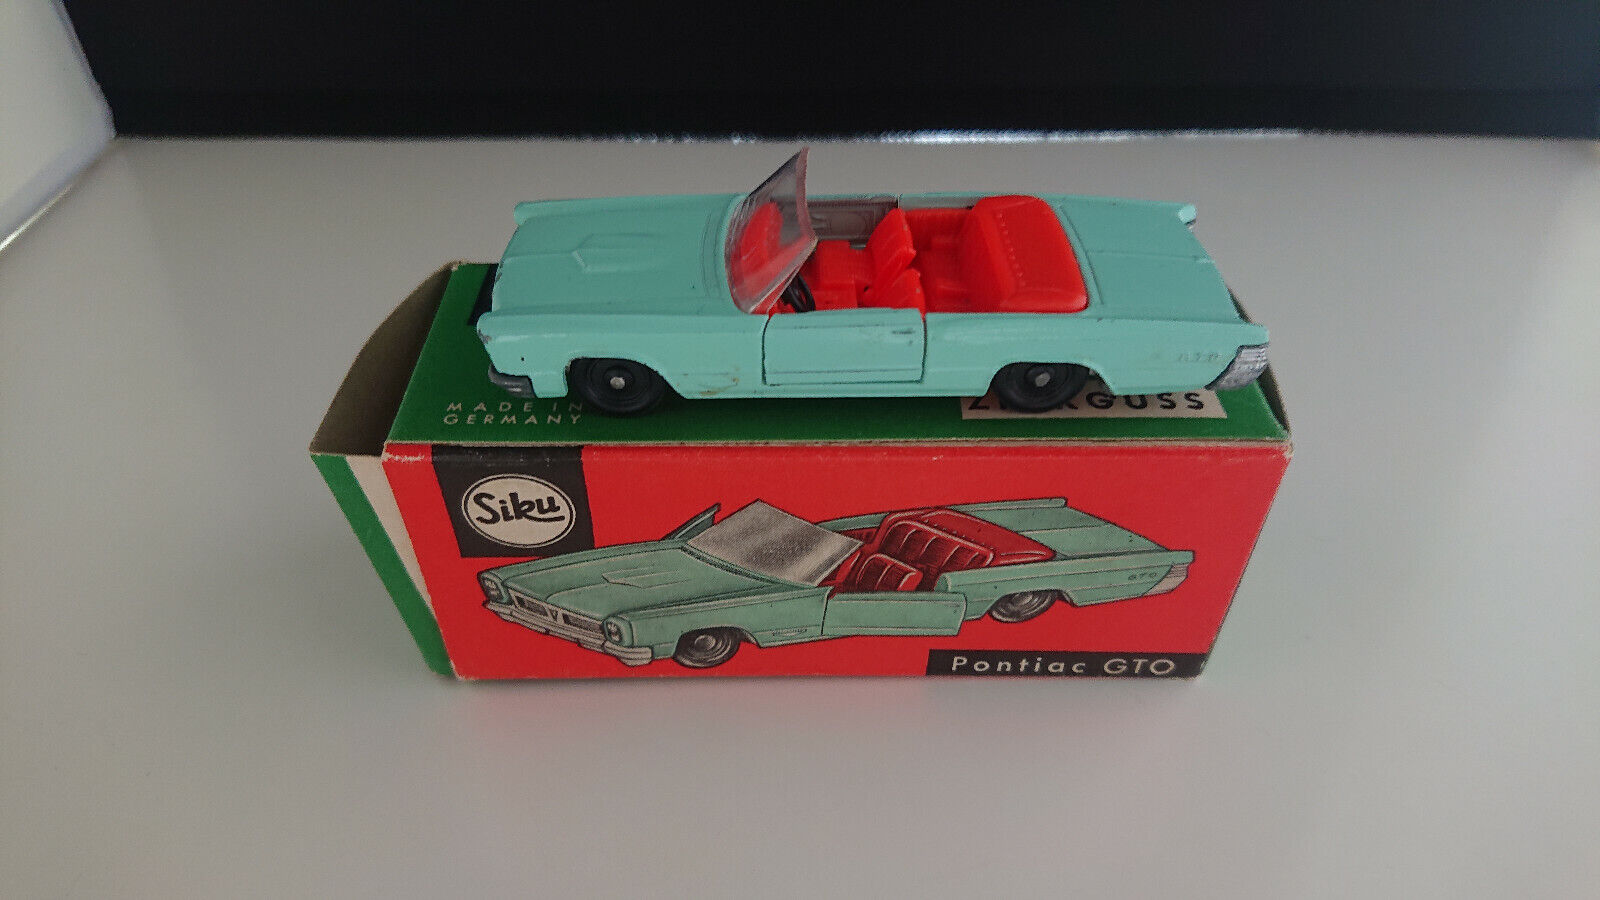 los nuevos estilos calientes Siku V-serie V-serie V-serie v277 Pontiac GTO luz verde OVP  calidad garantizada